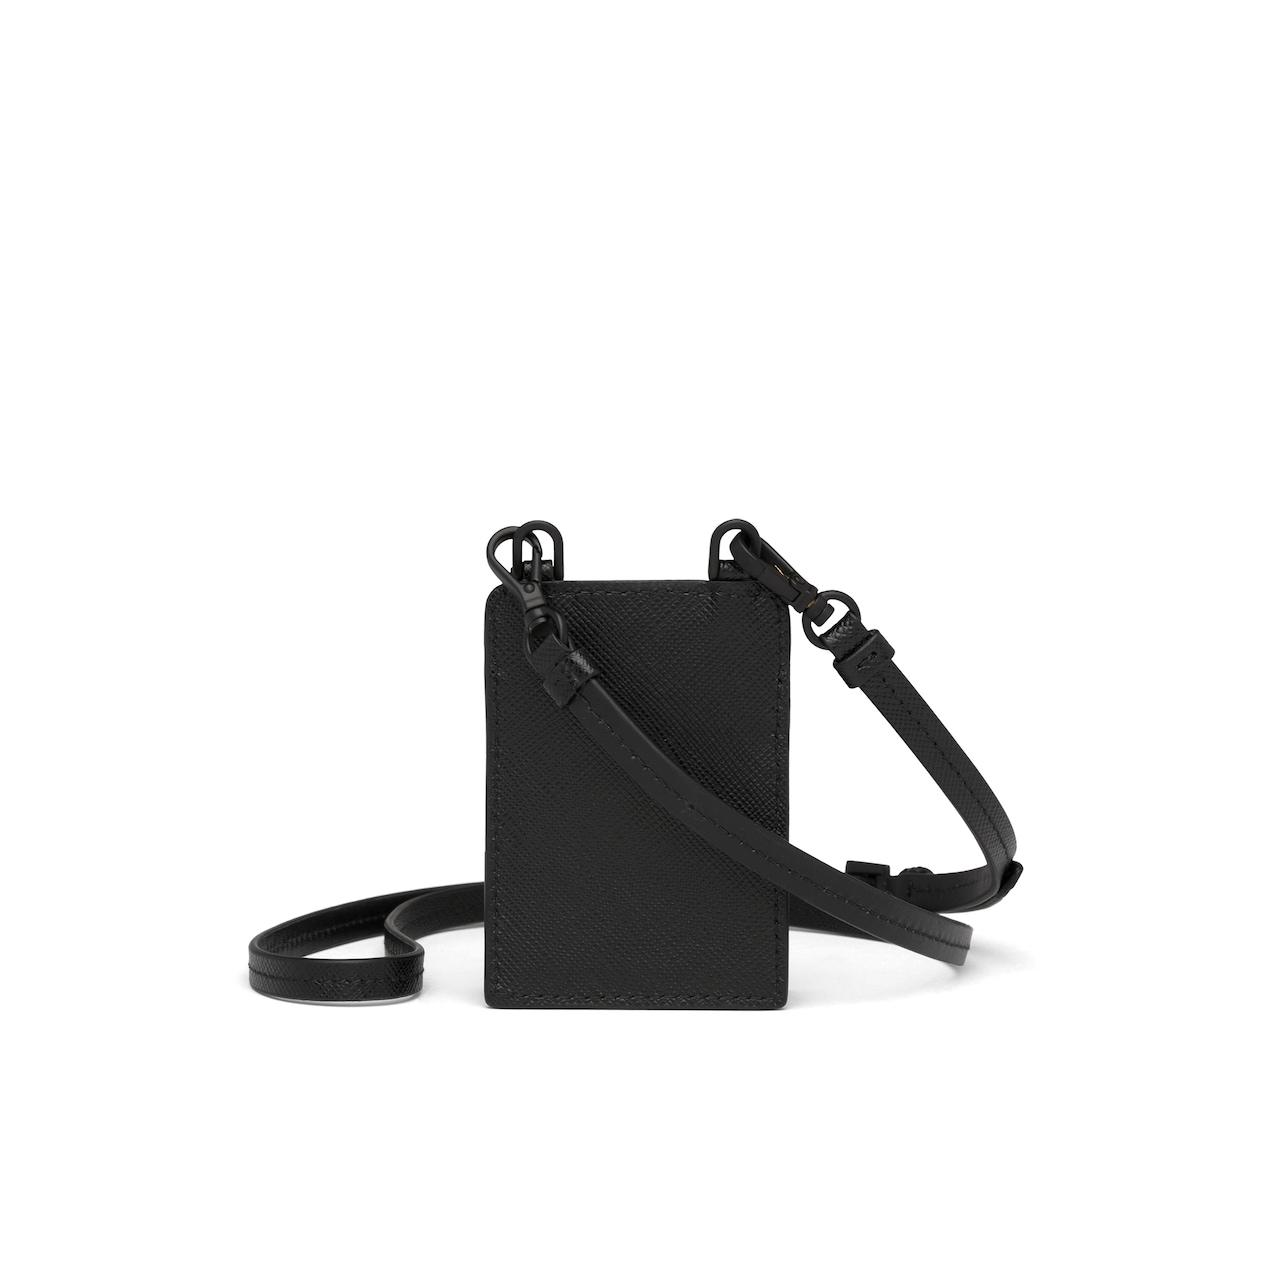 Prada Headphone case with shoulder strap 2